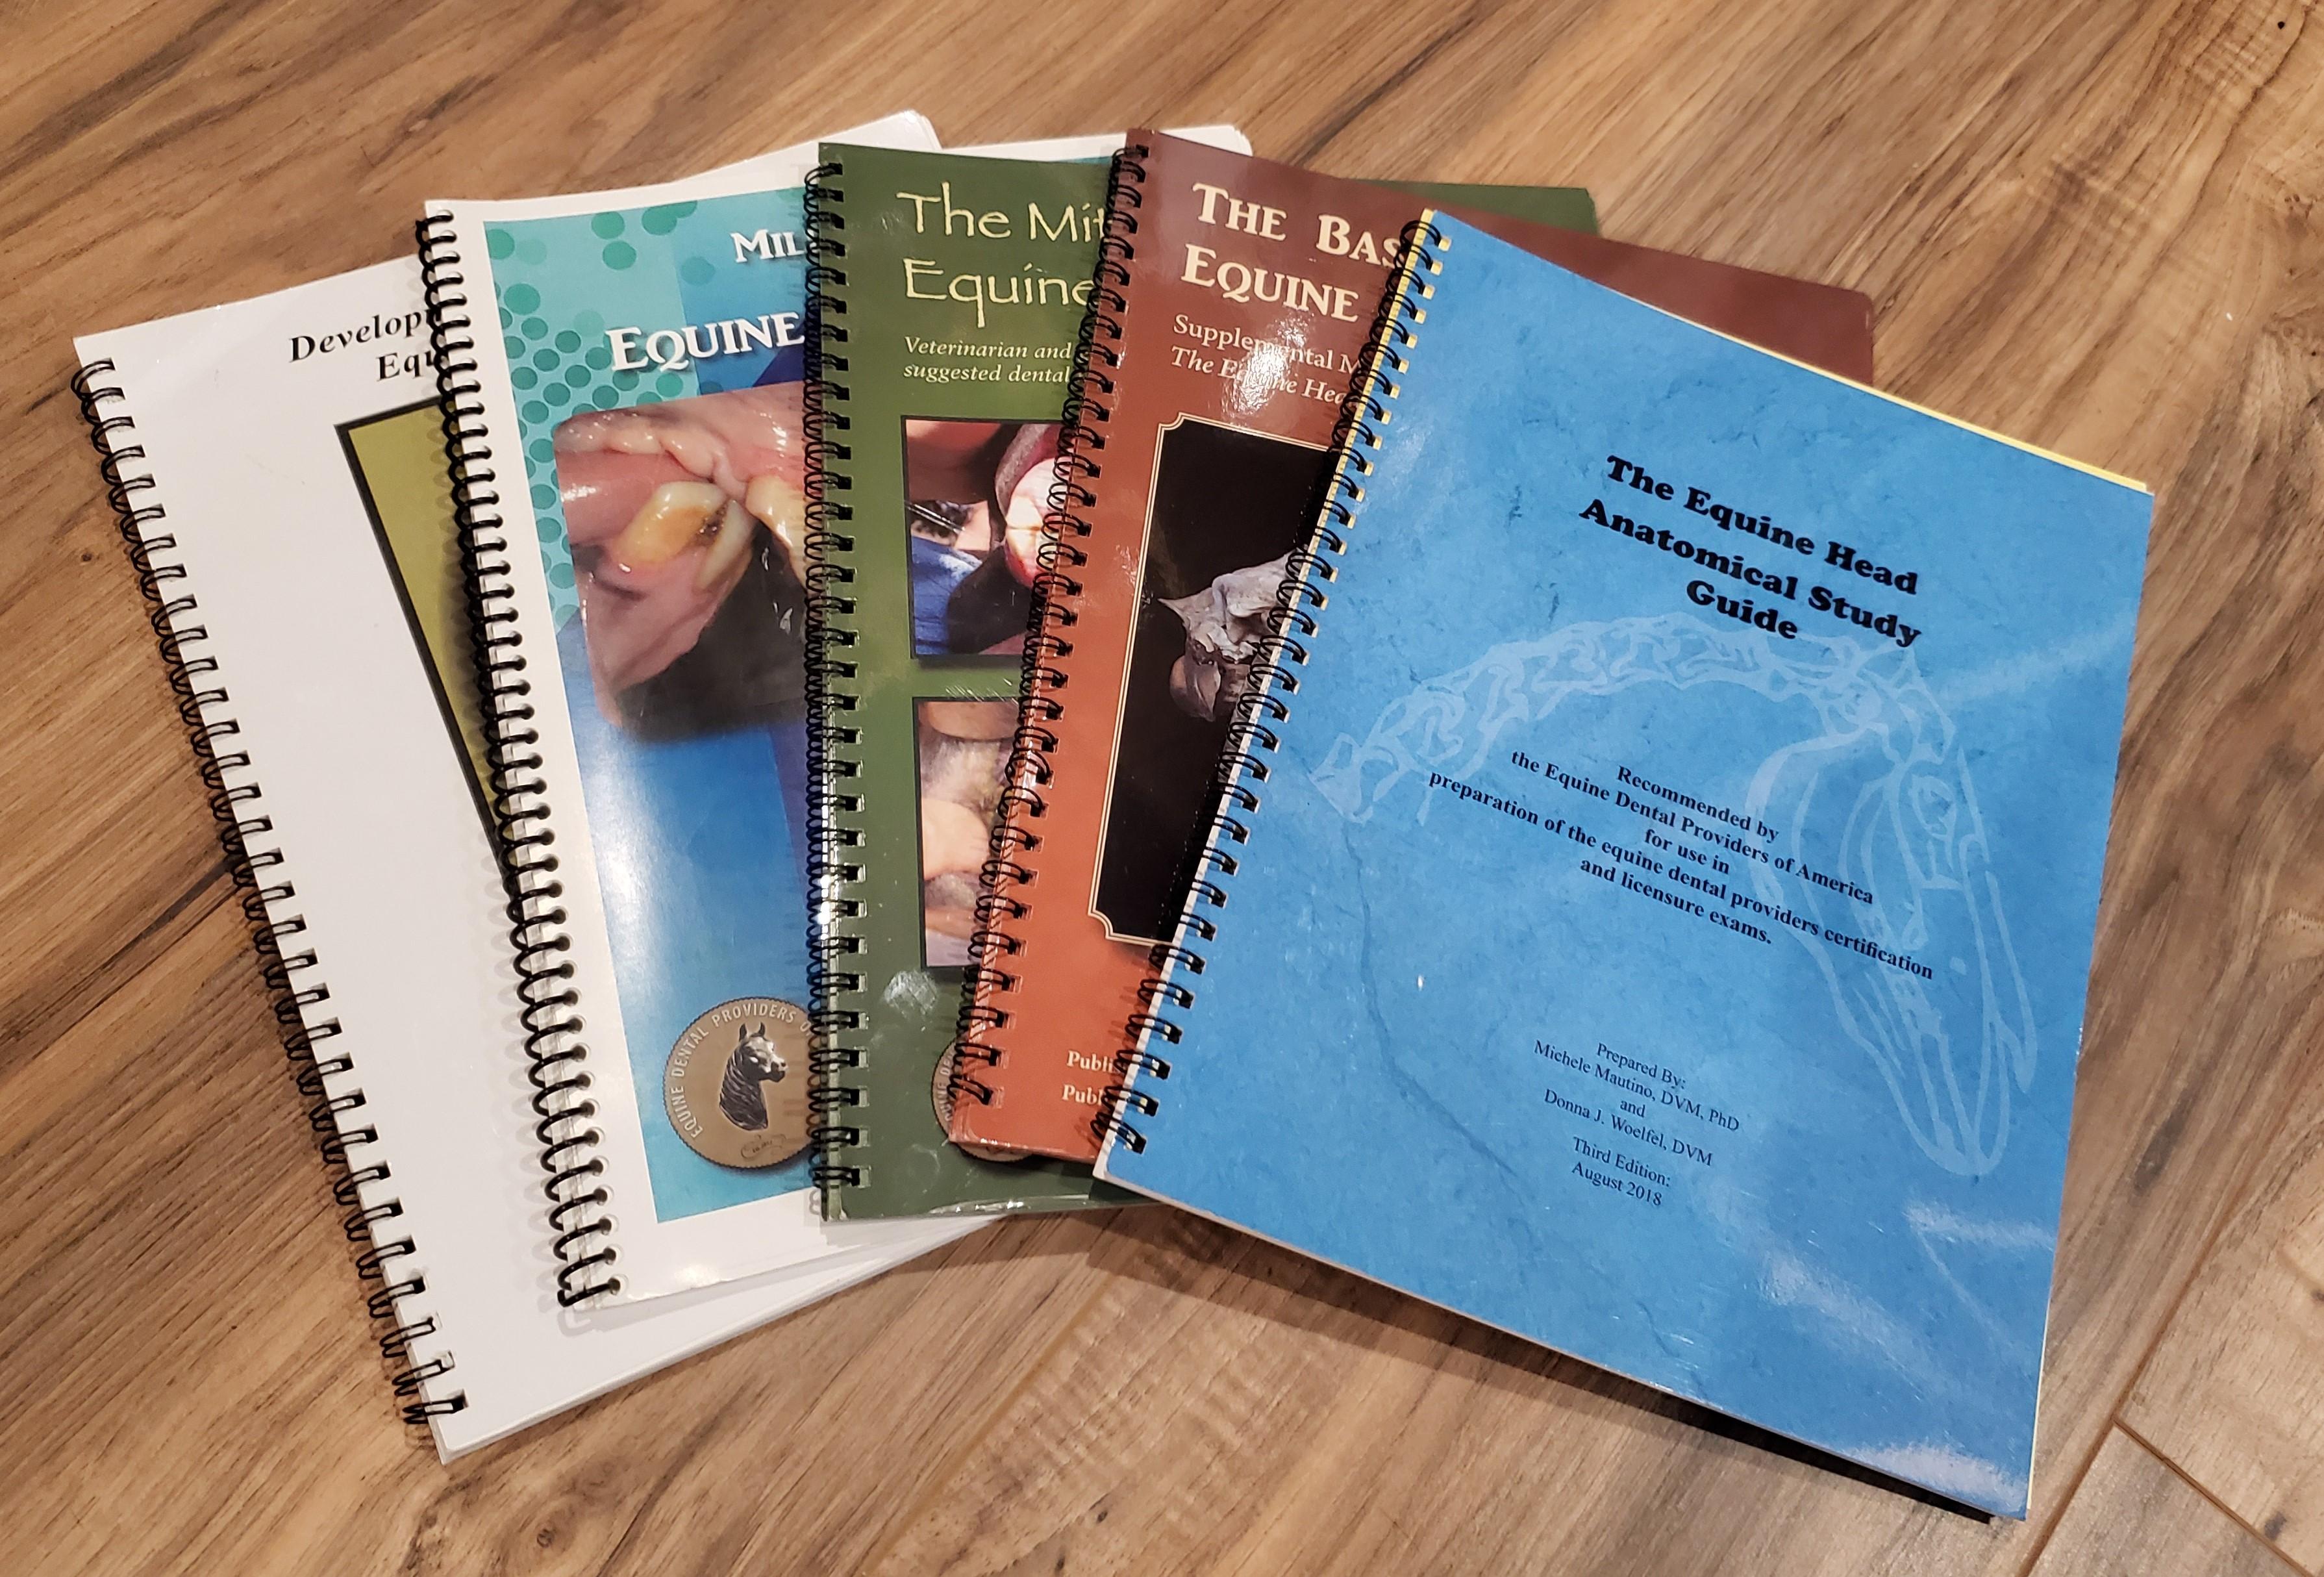 Equine anatomy books